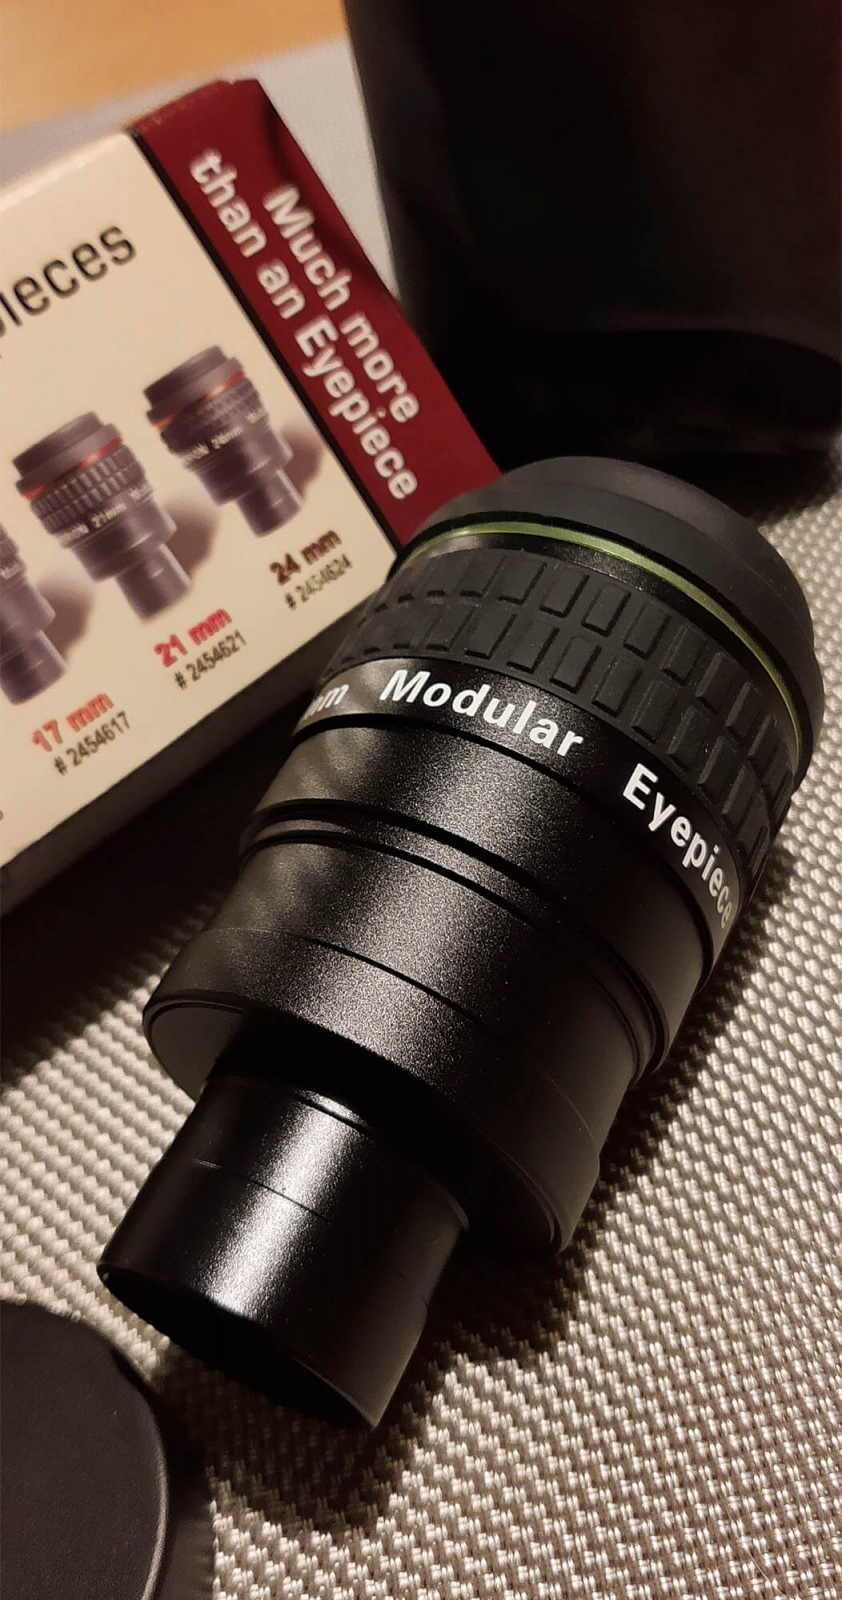 okular-baader-01.thumb.jpg.f02595752ec2ce0c6cc03d3a1071e4f8.jpg